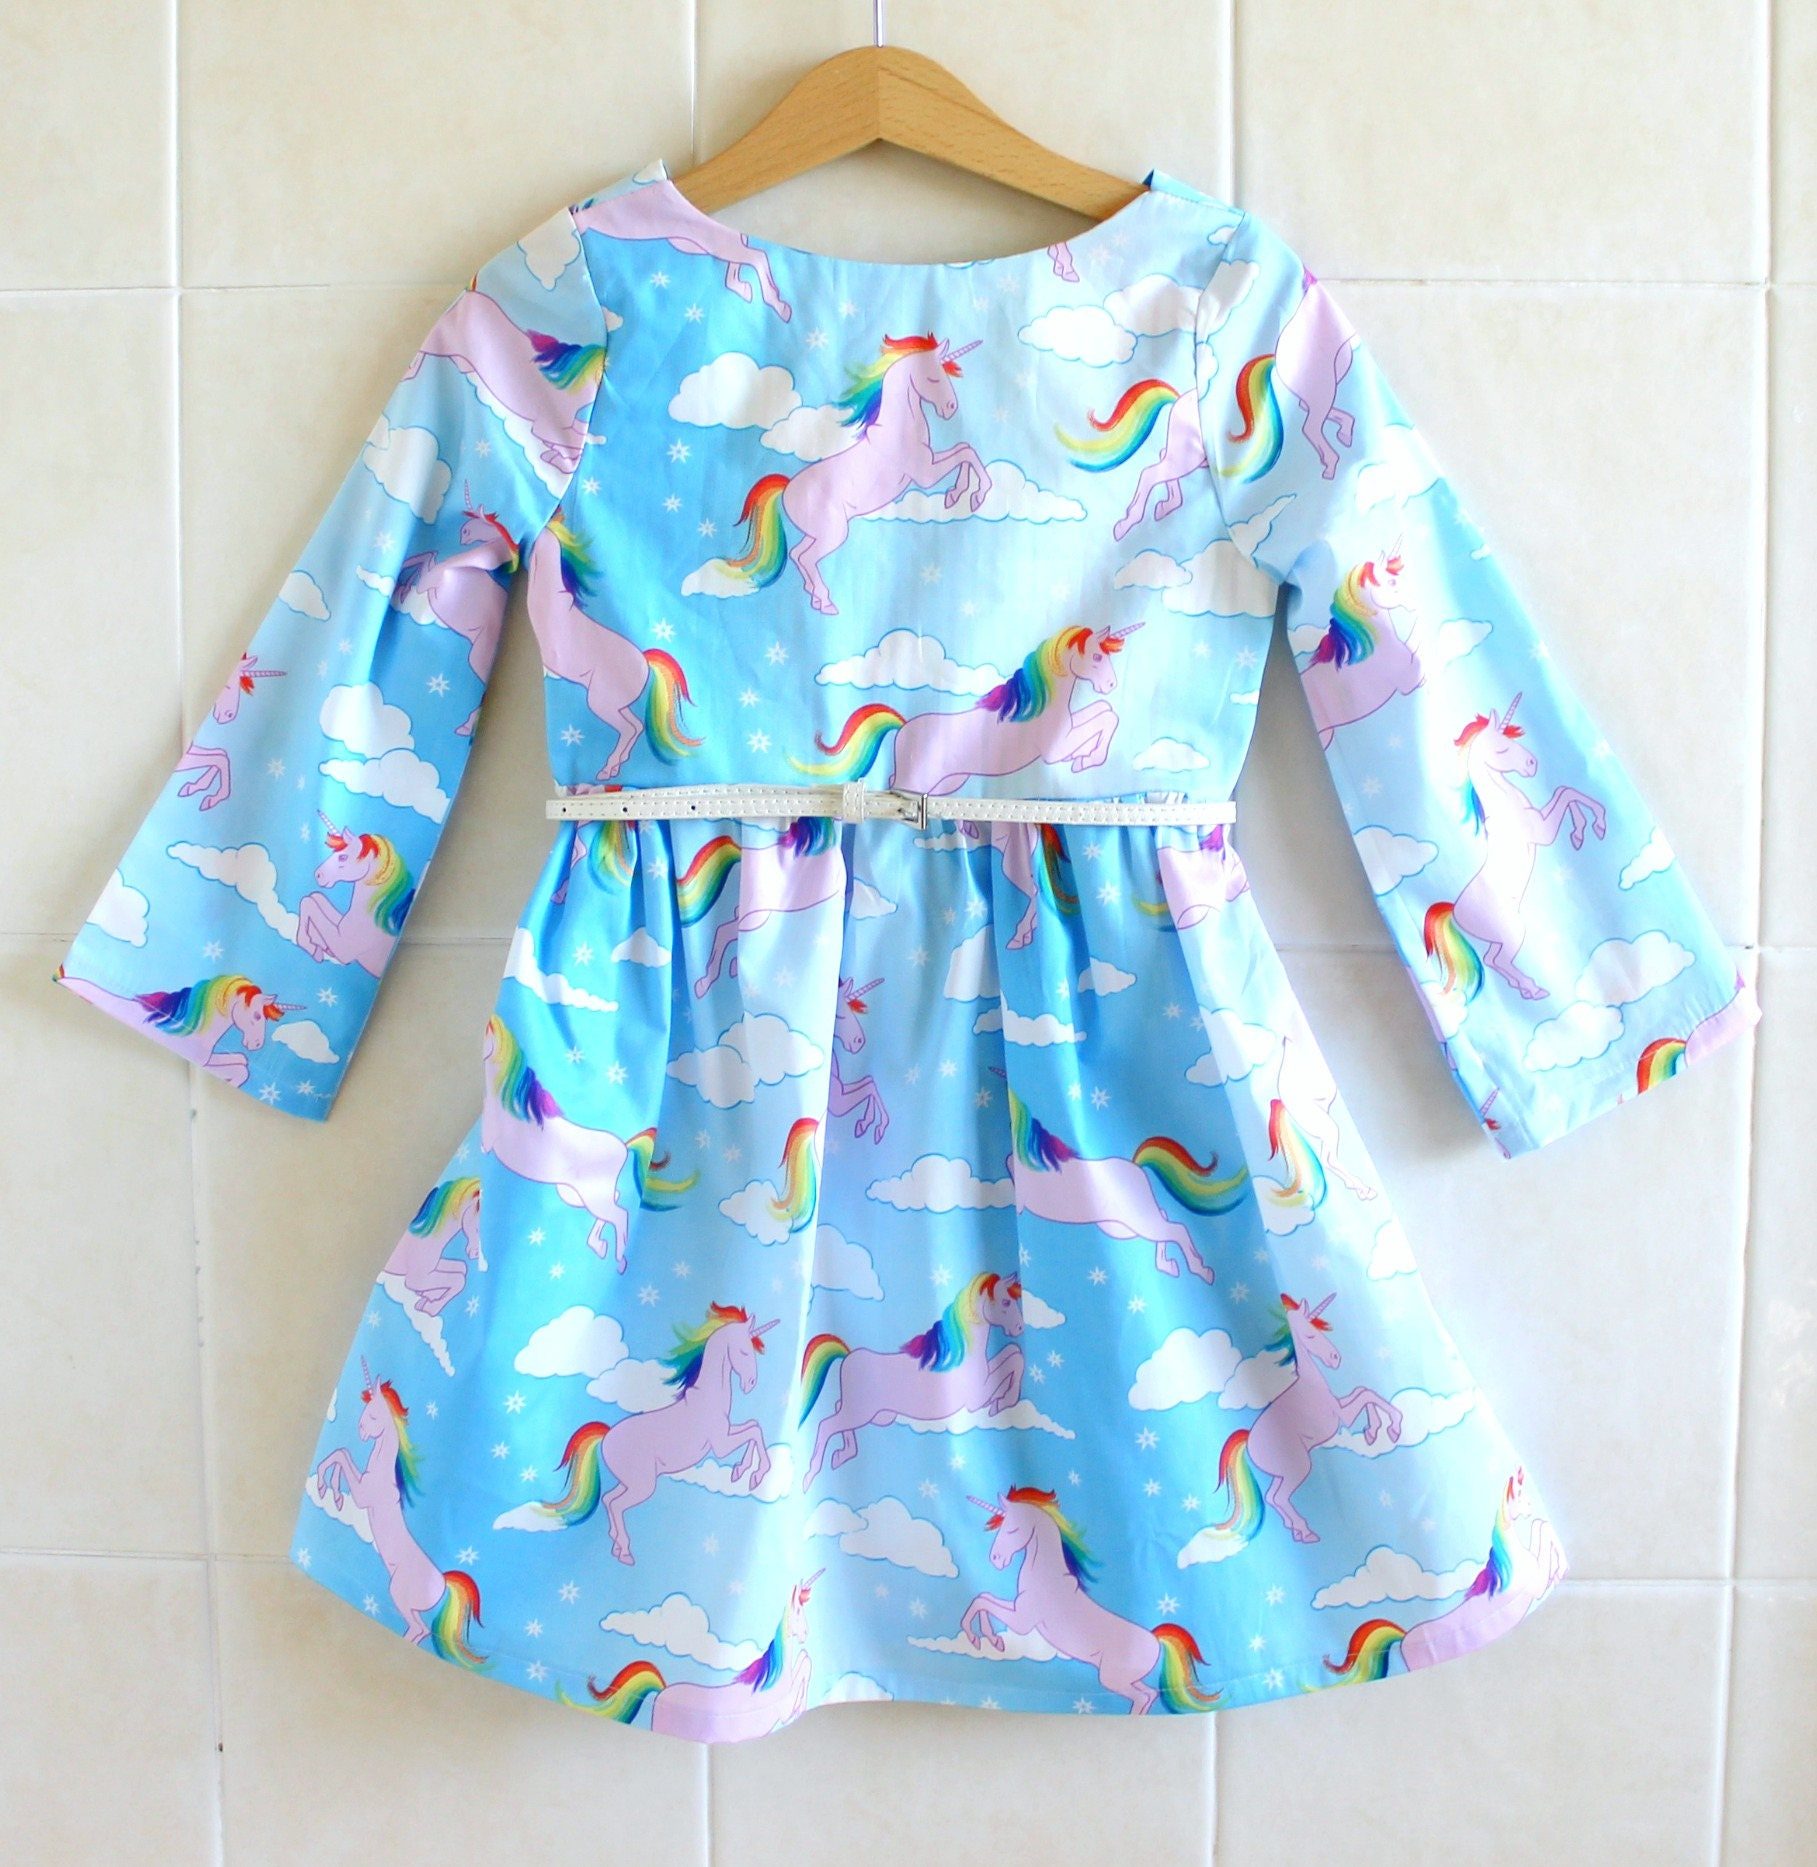 Rainbow Unicorn Girls dress rainbow dress winter dress